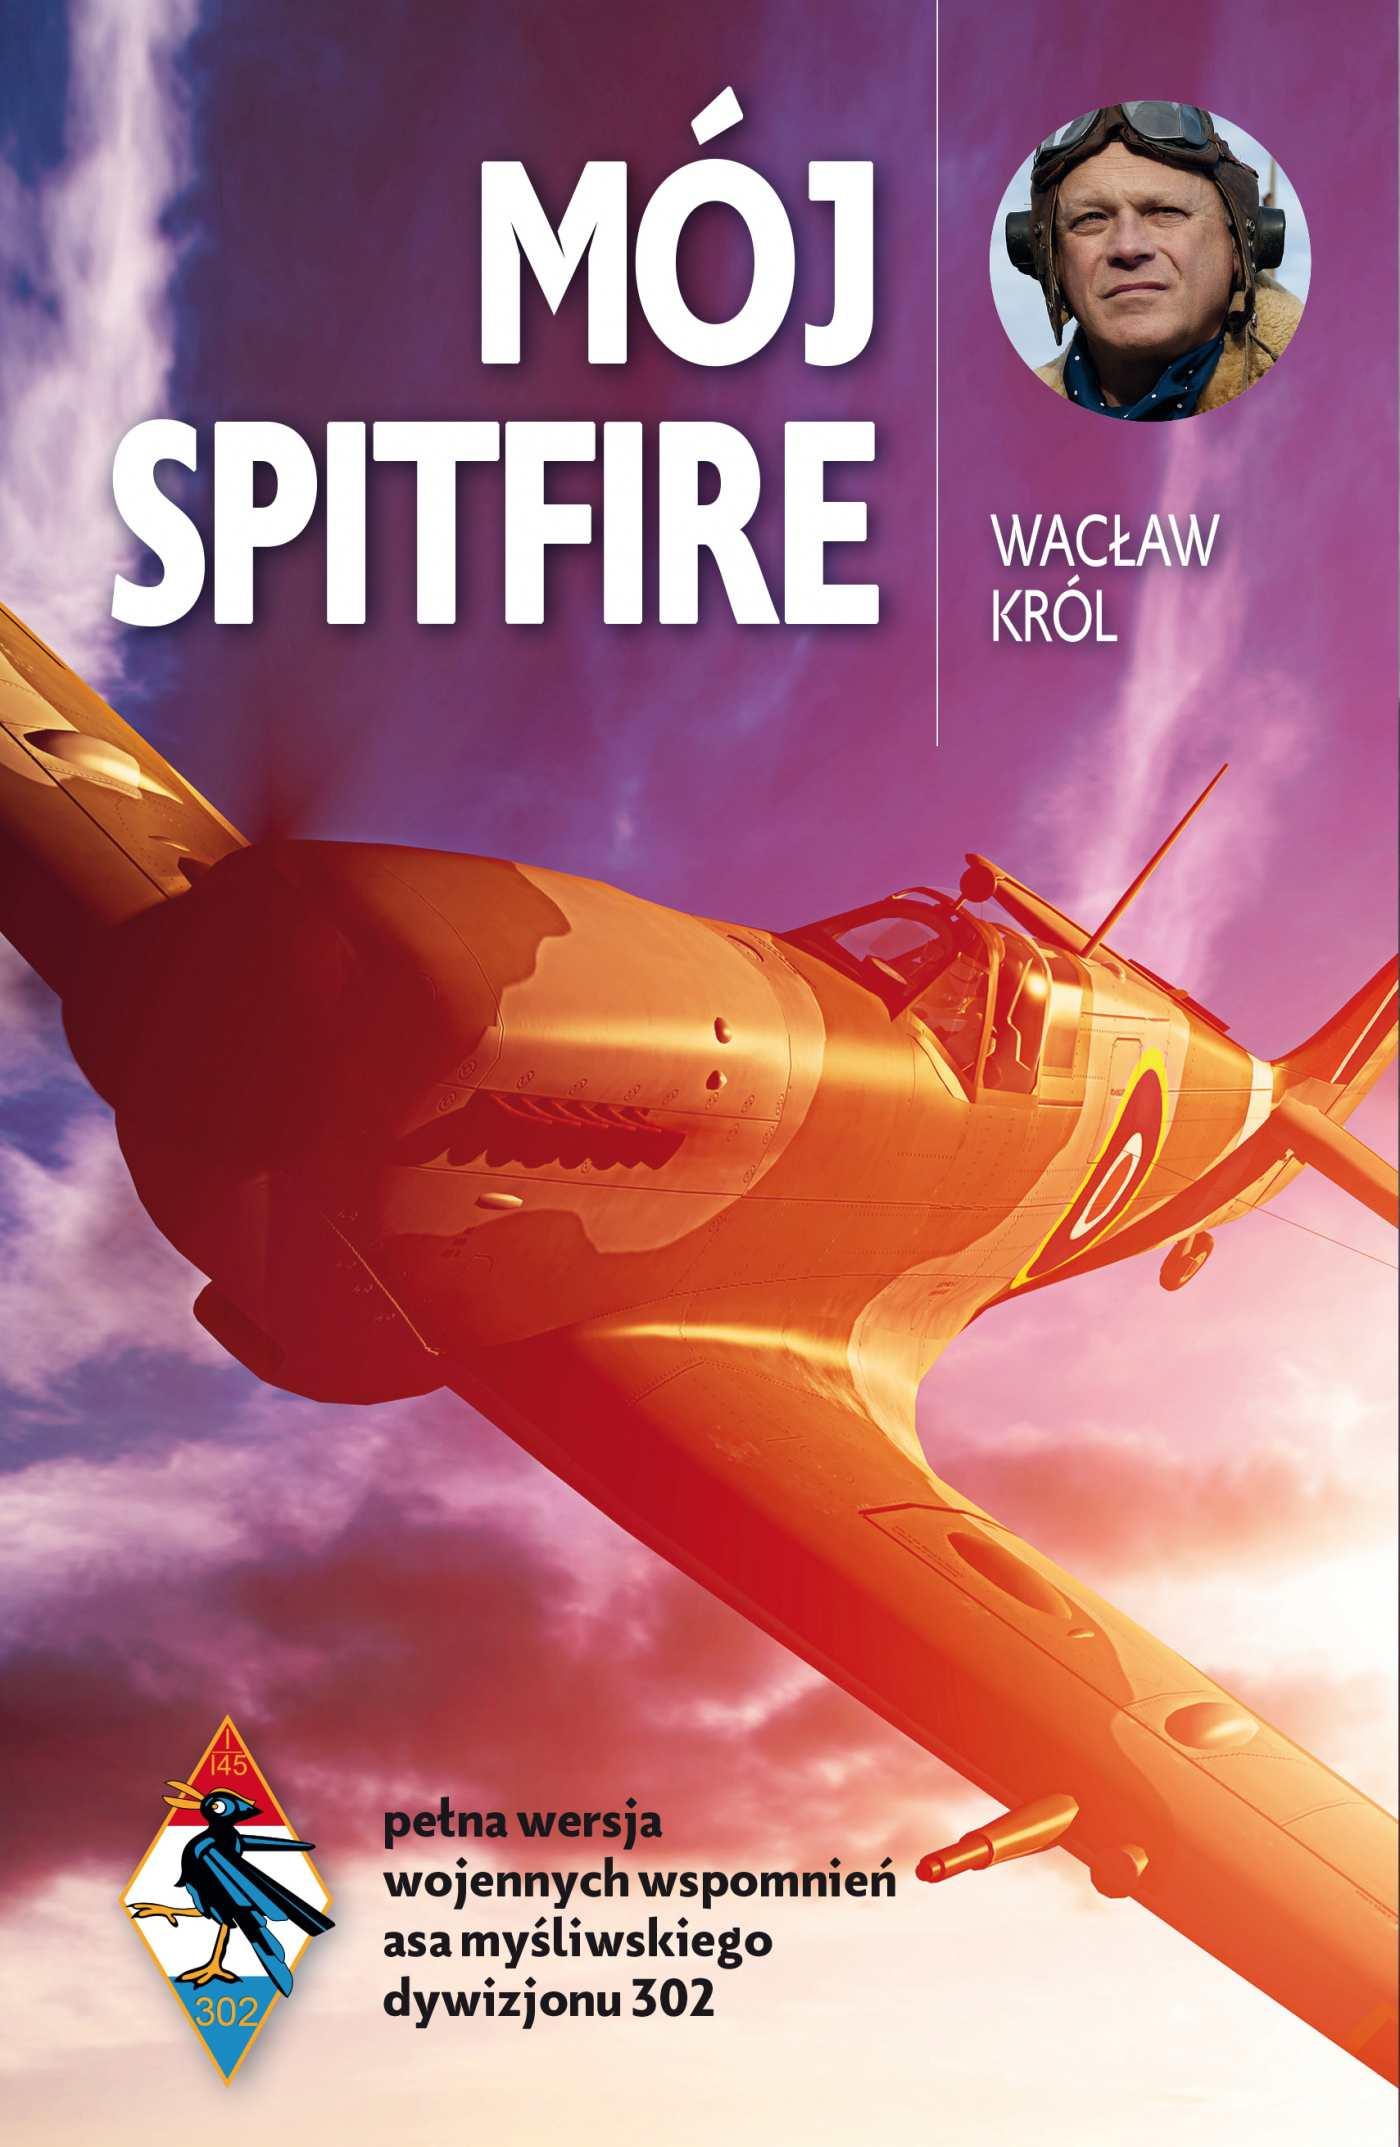 Mój spitfire - Ebook (Książka EPUB) do pobrania w formacie EPUB